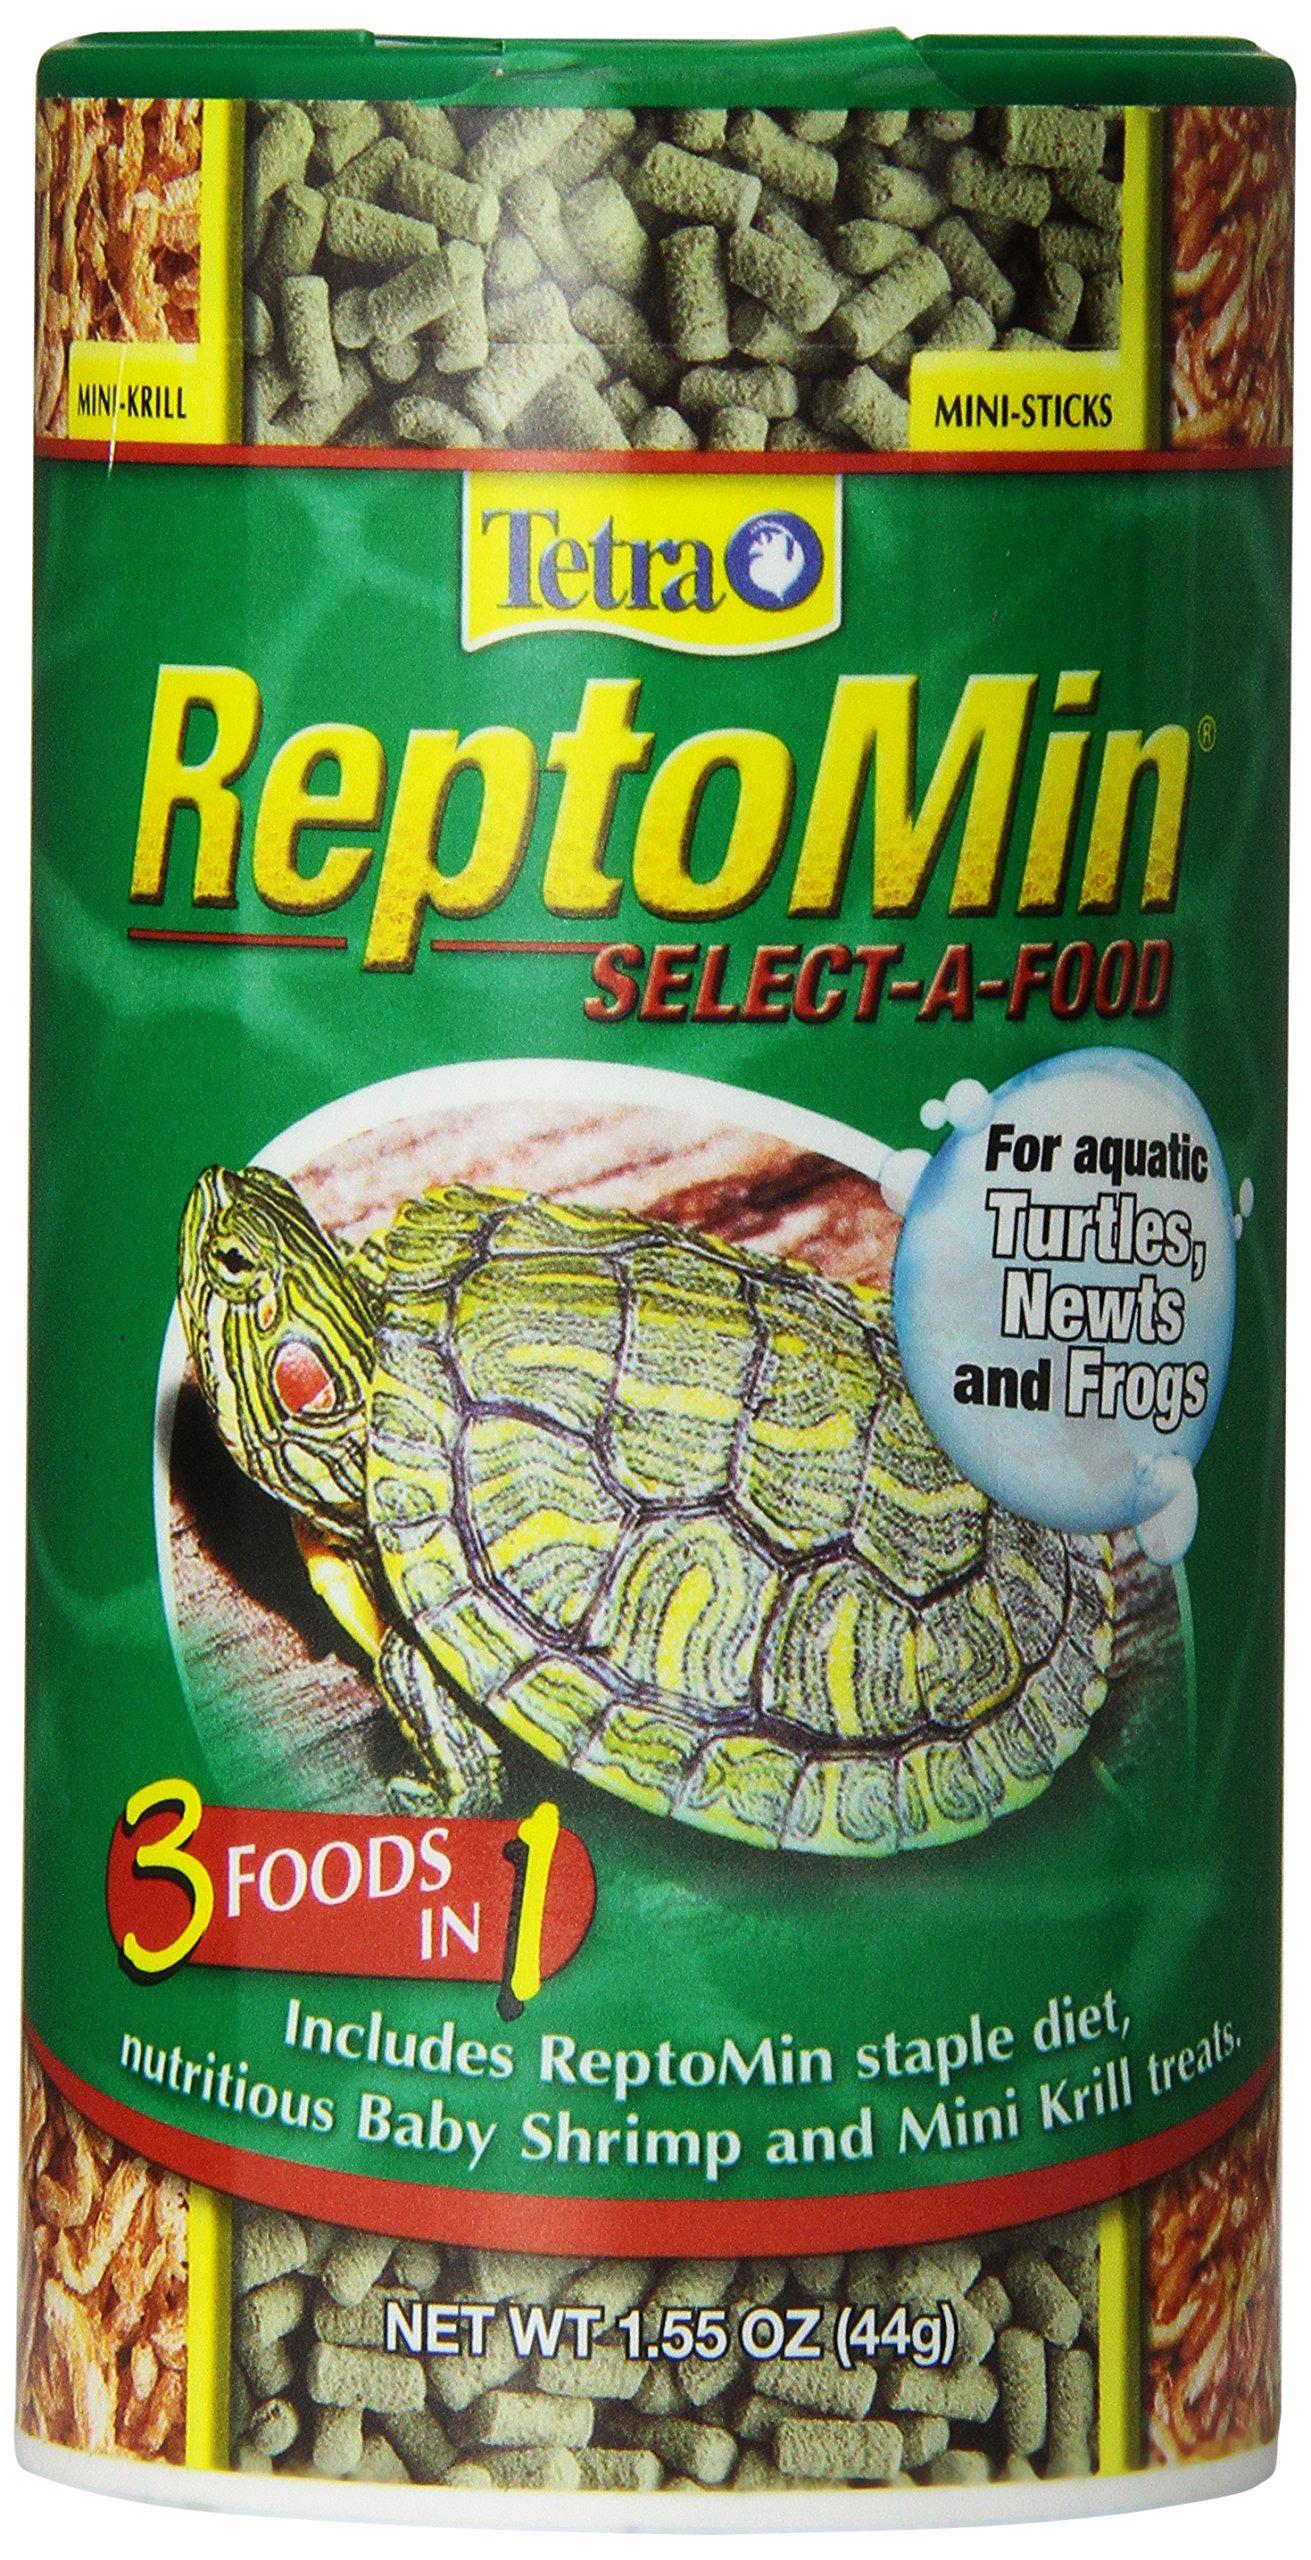 Tetra TetraFauna ReptoMin Select-A-Food for Aquatic Turtles, Newts & Frogs